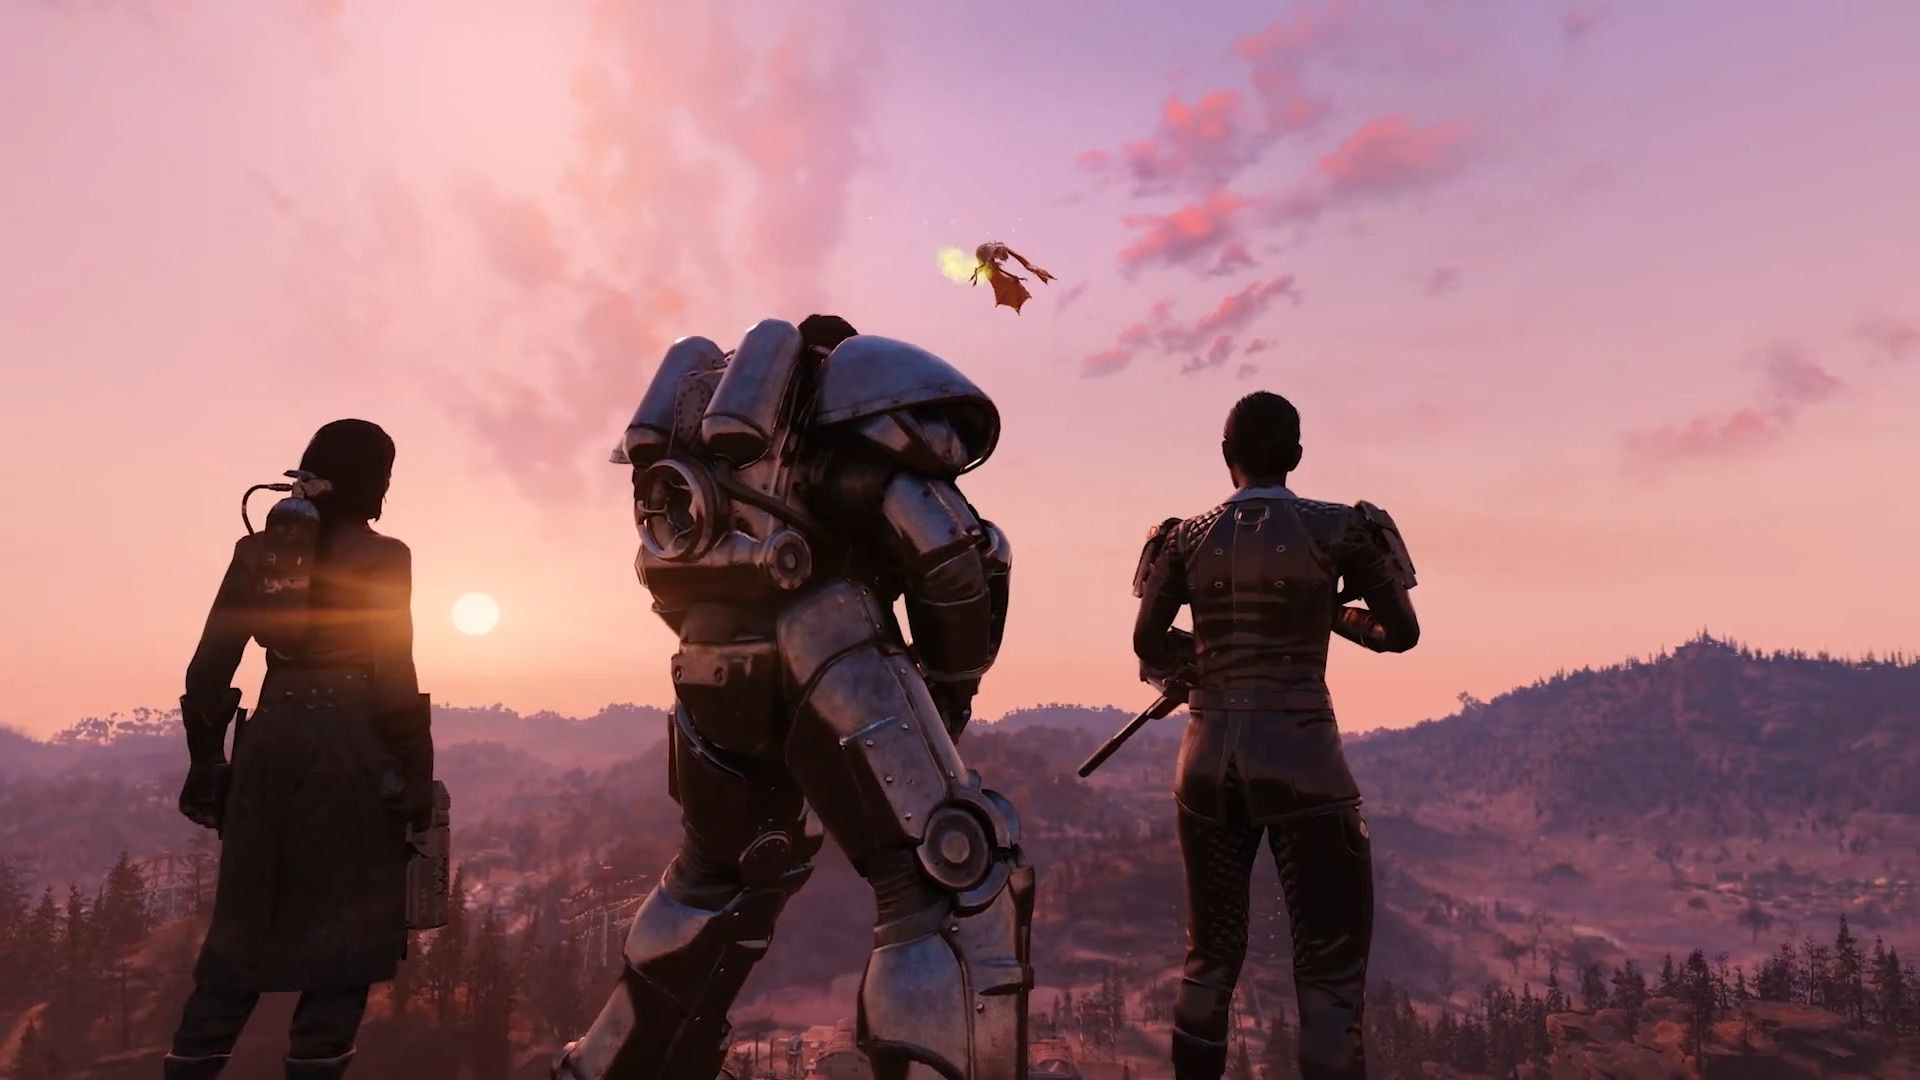 Trailer, Online-Spiele, Mmorpg, Mmo, Bethesda, Online-Rollenspiel, Fallout, Fallout 76, Stählerne Dämmerung